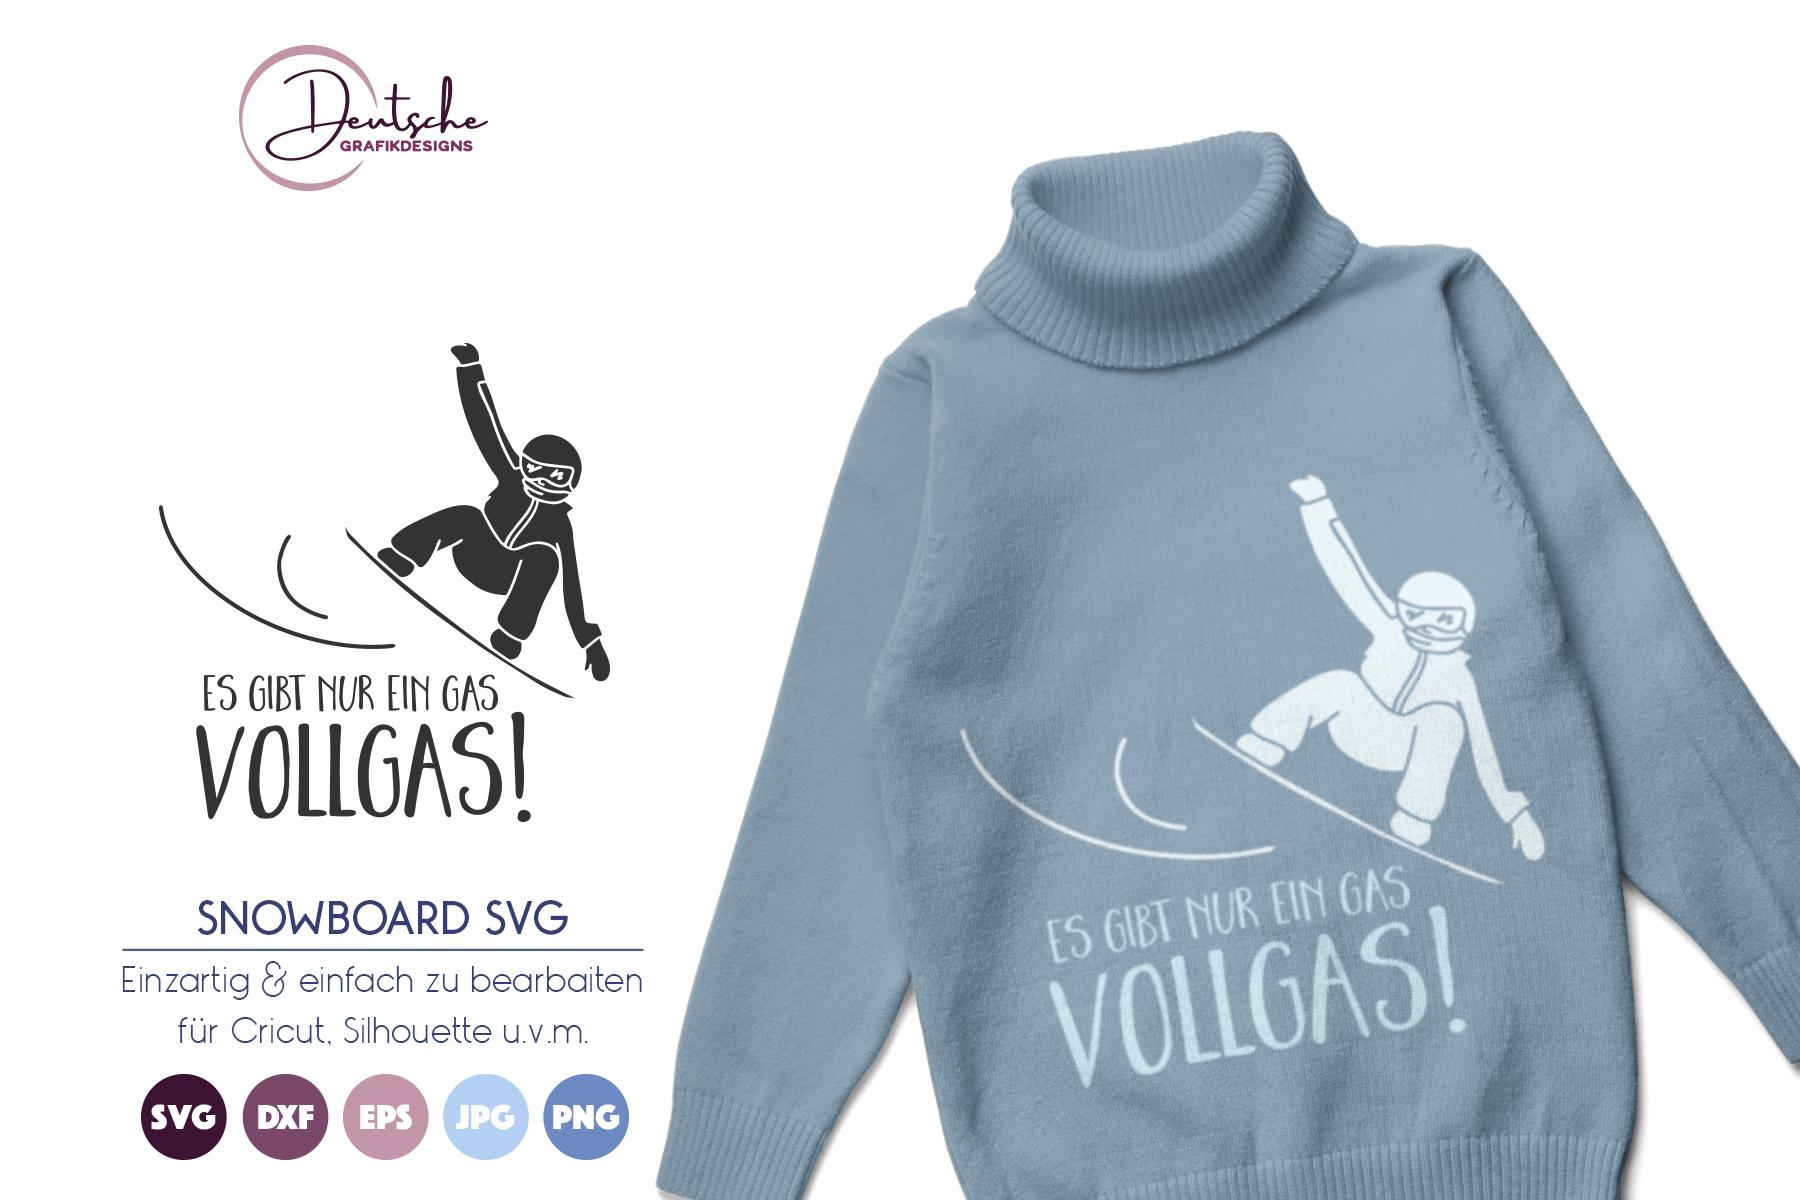 Snowboard SVG | Vollgas example image 1